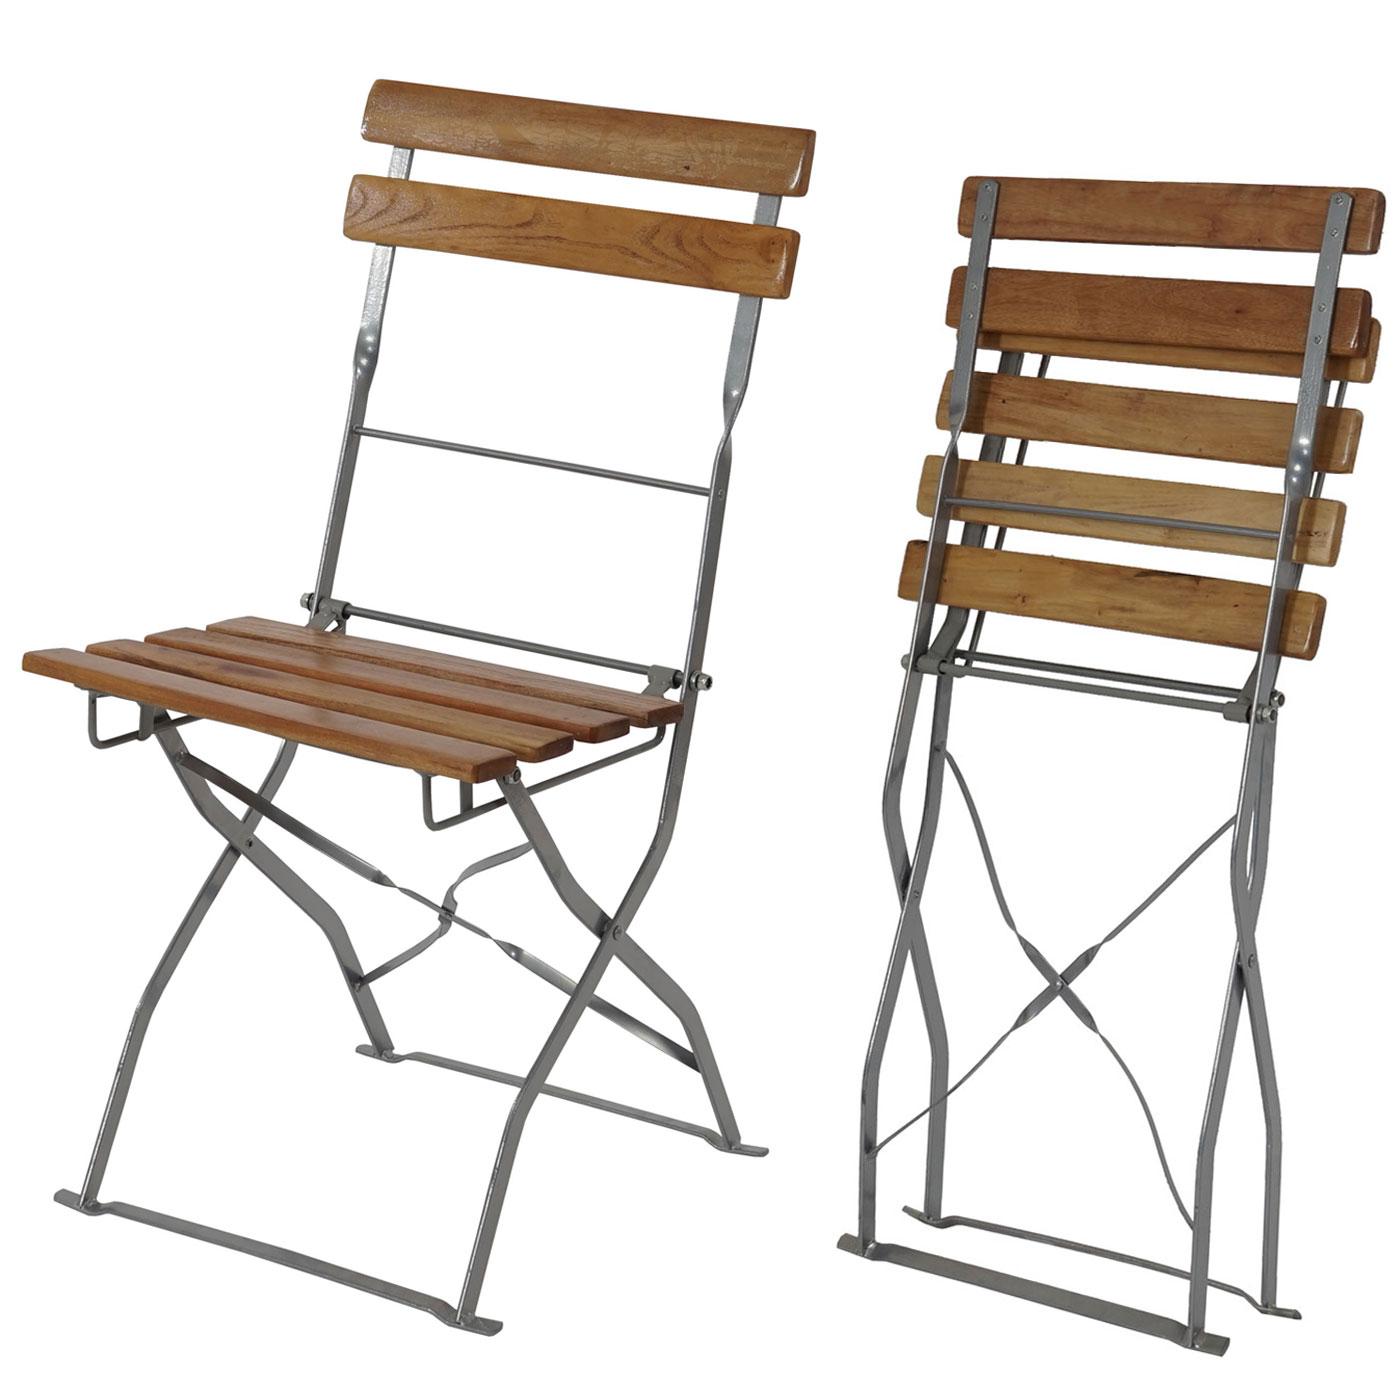 2x biergartenstuhl berlin klappstuhl gartenstuhl akazie lackiert natur. Black Bedroom Furniture Sets. Home Design Ideas